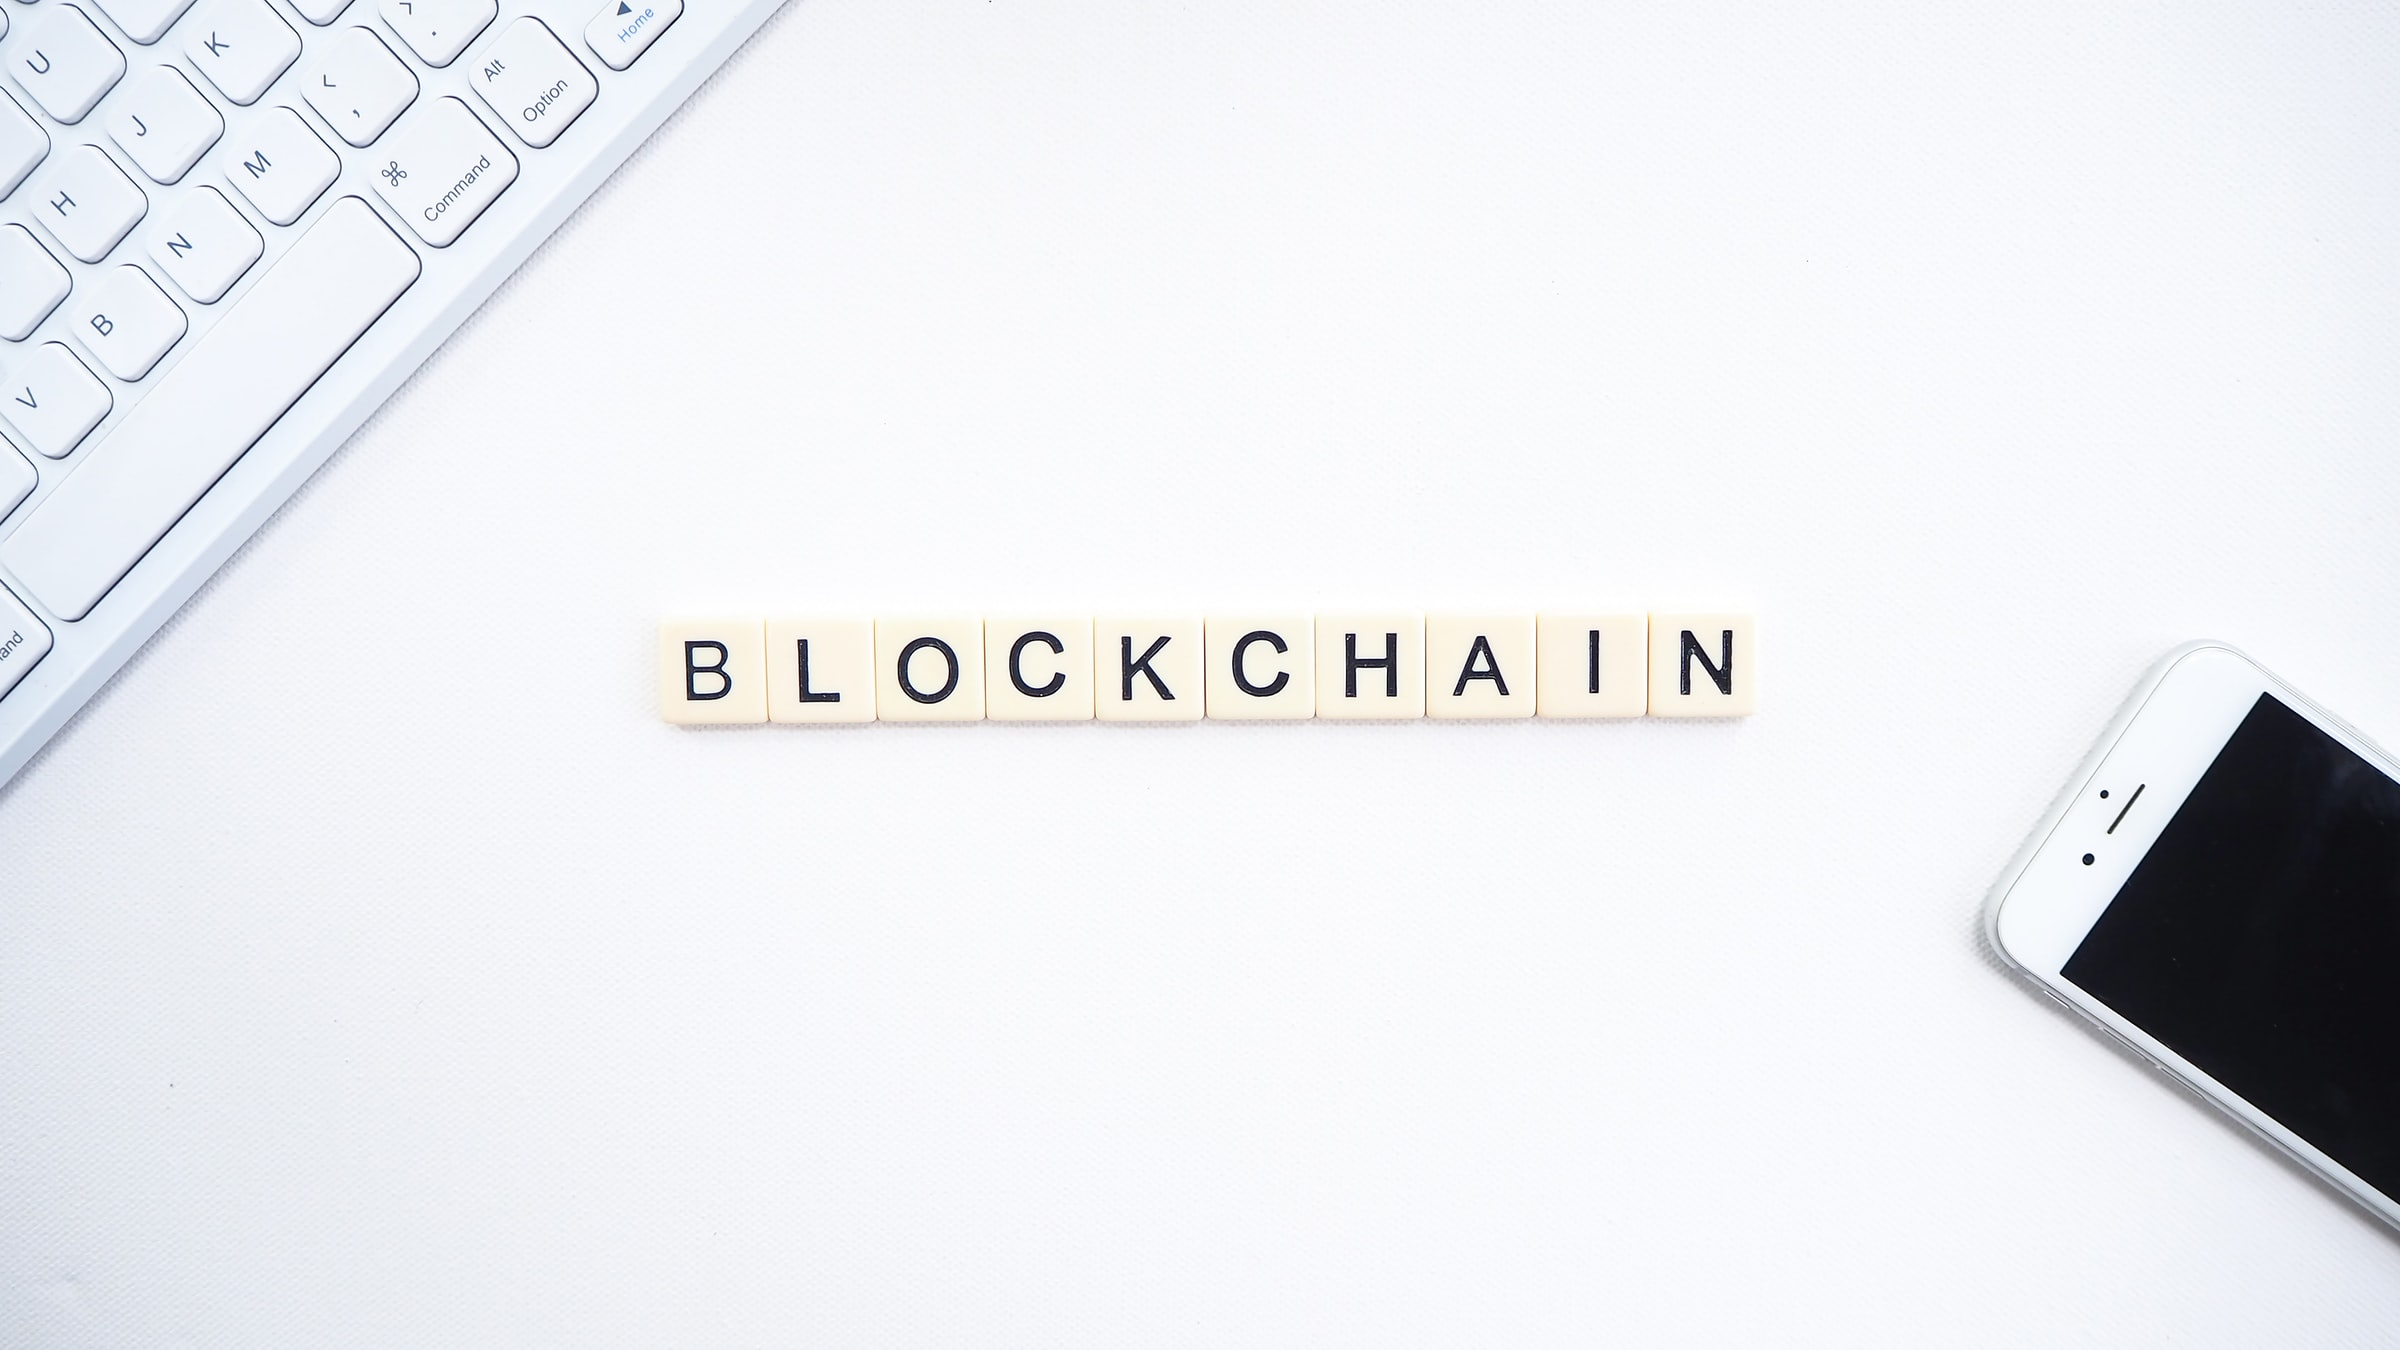 Blockchain: A Simple Beginner's Guide